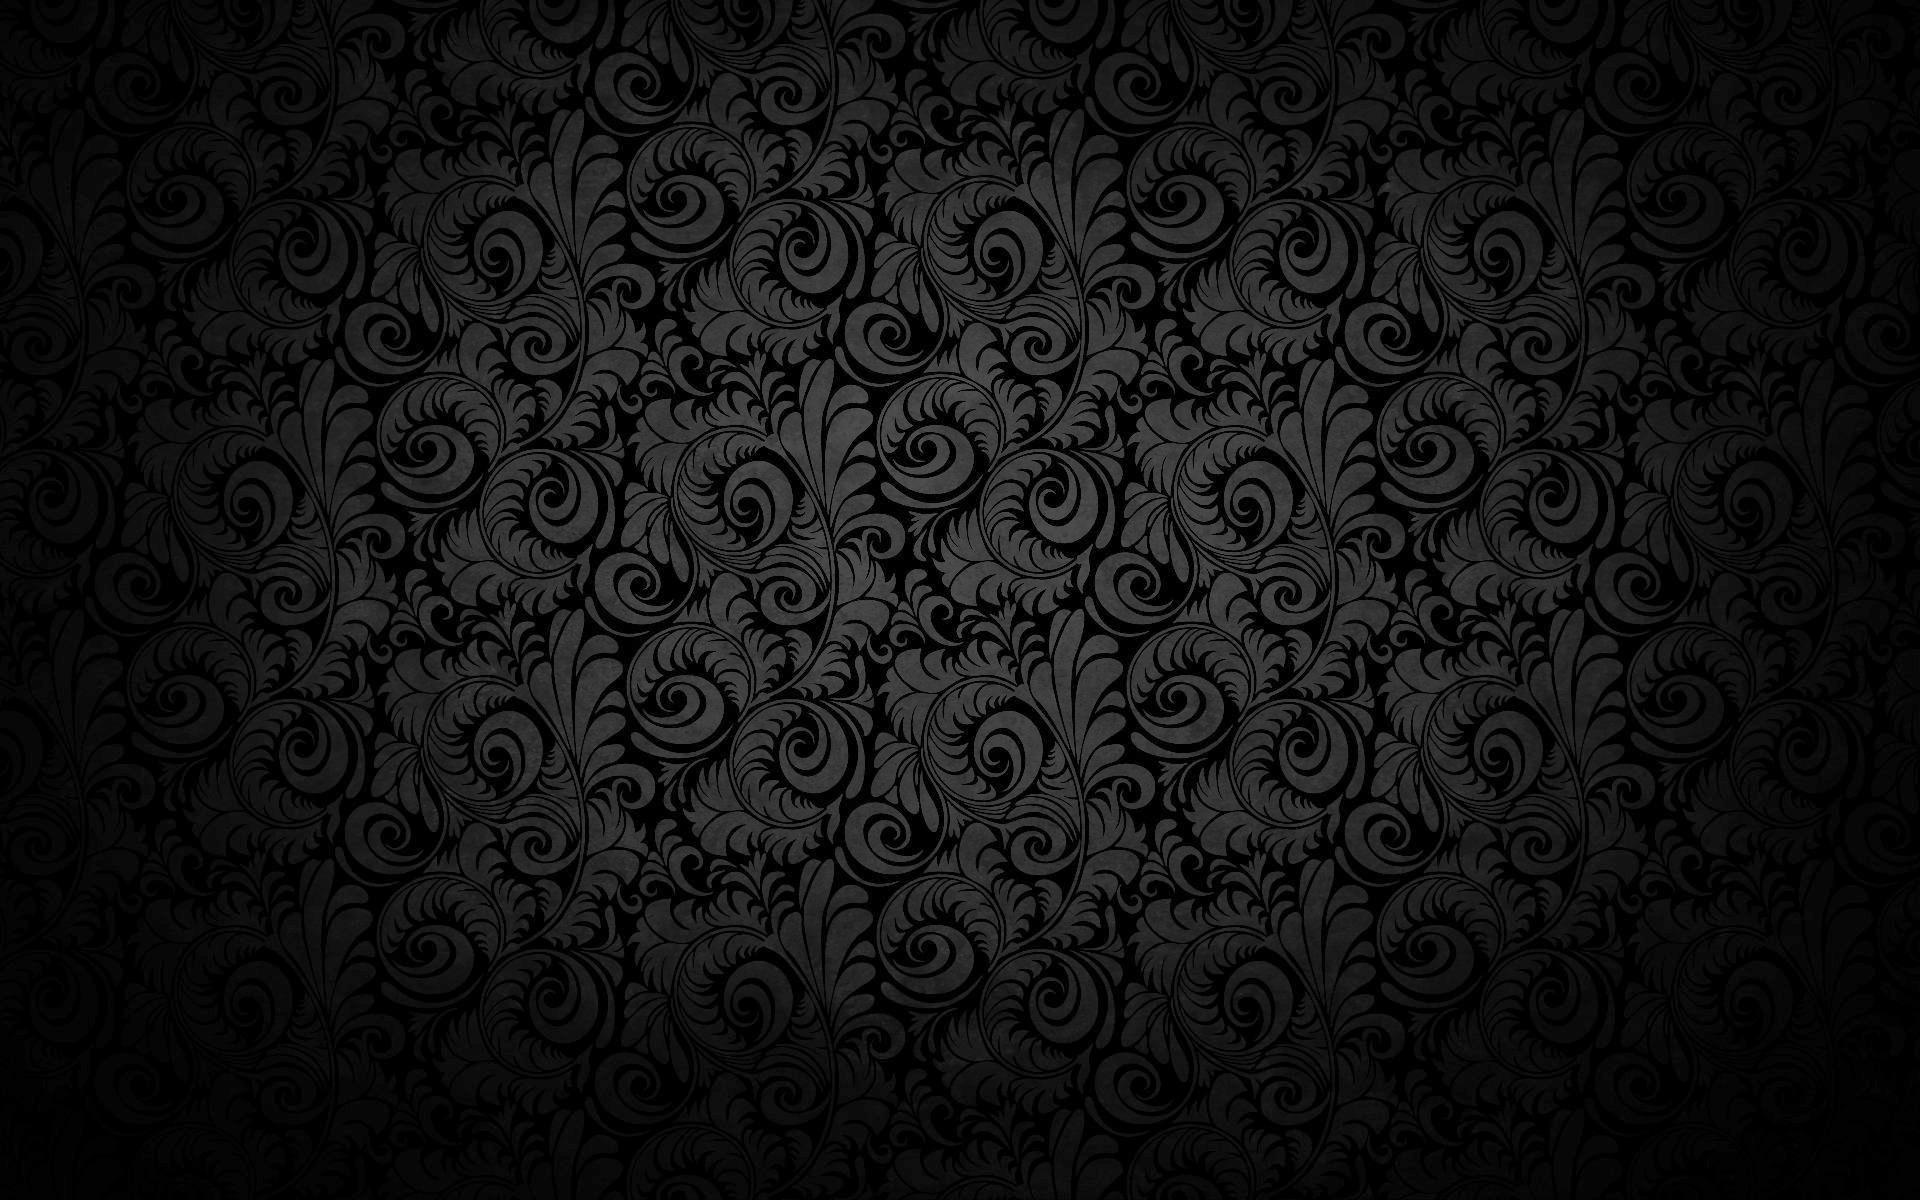 Black Background Design Wallpaper Widescreen Imperial Design